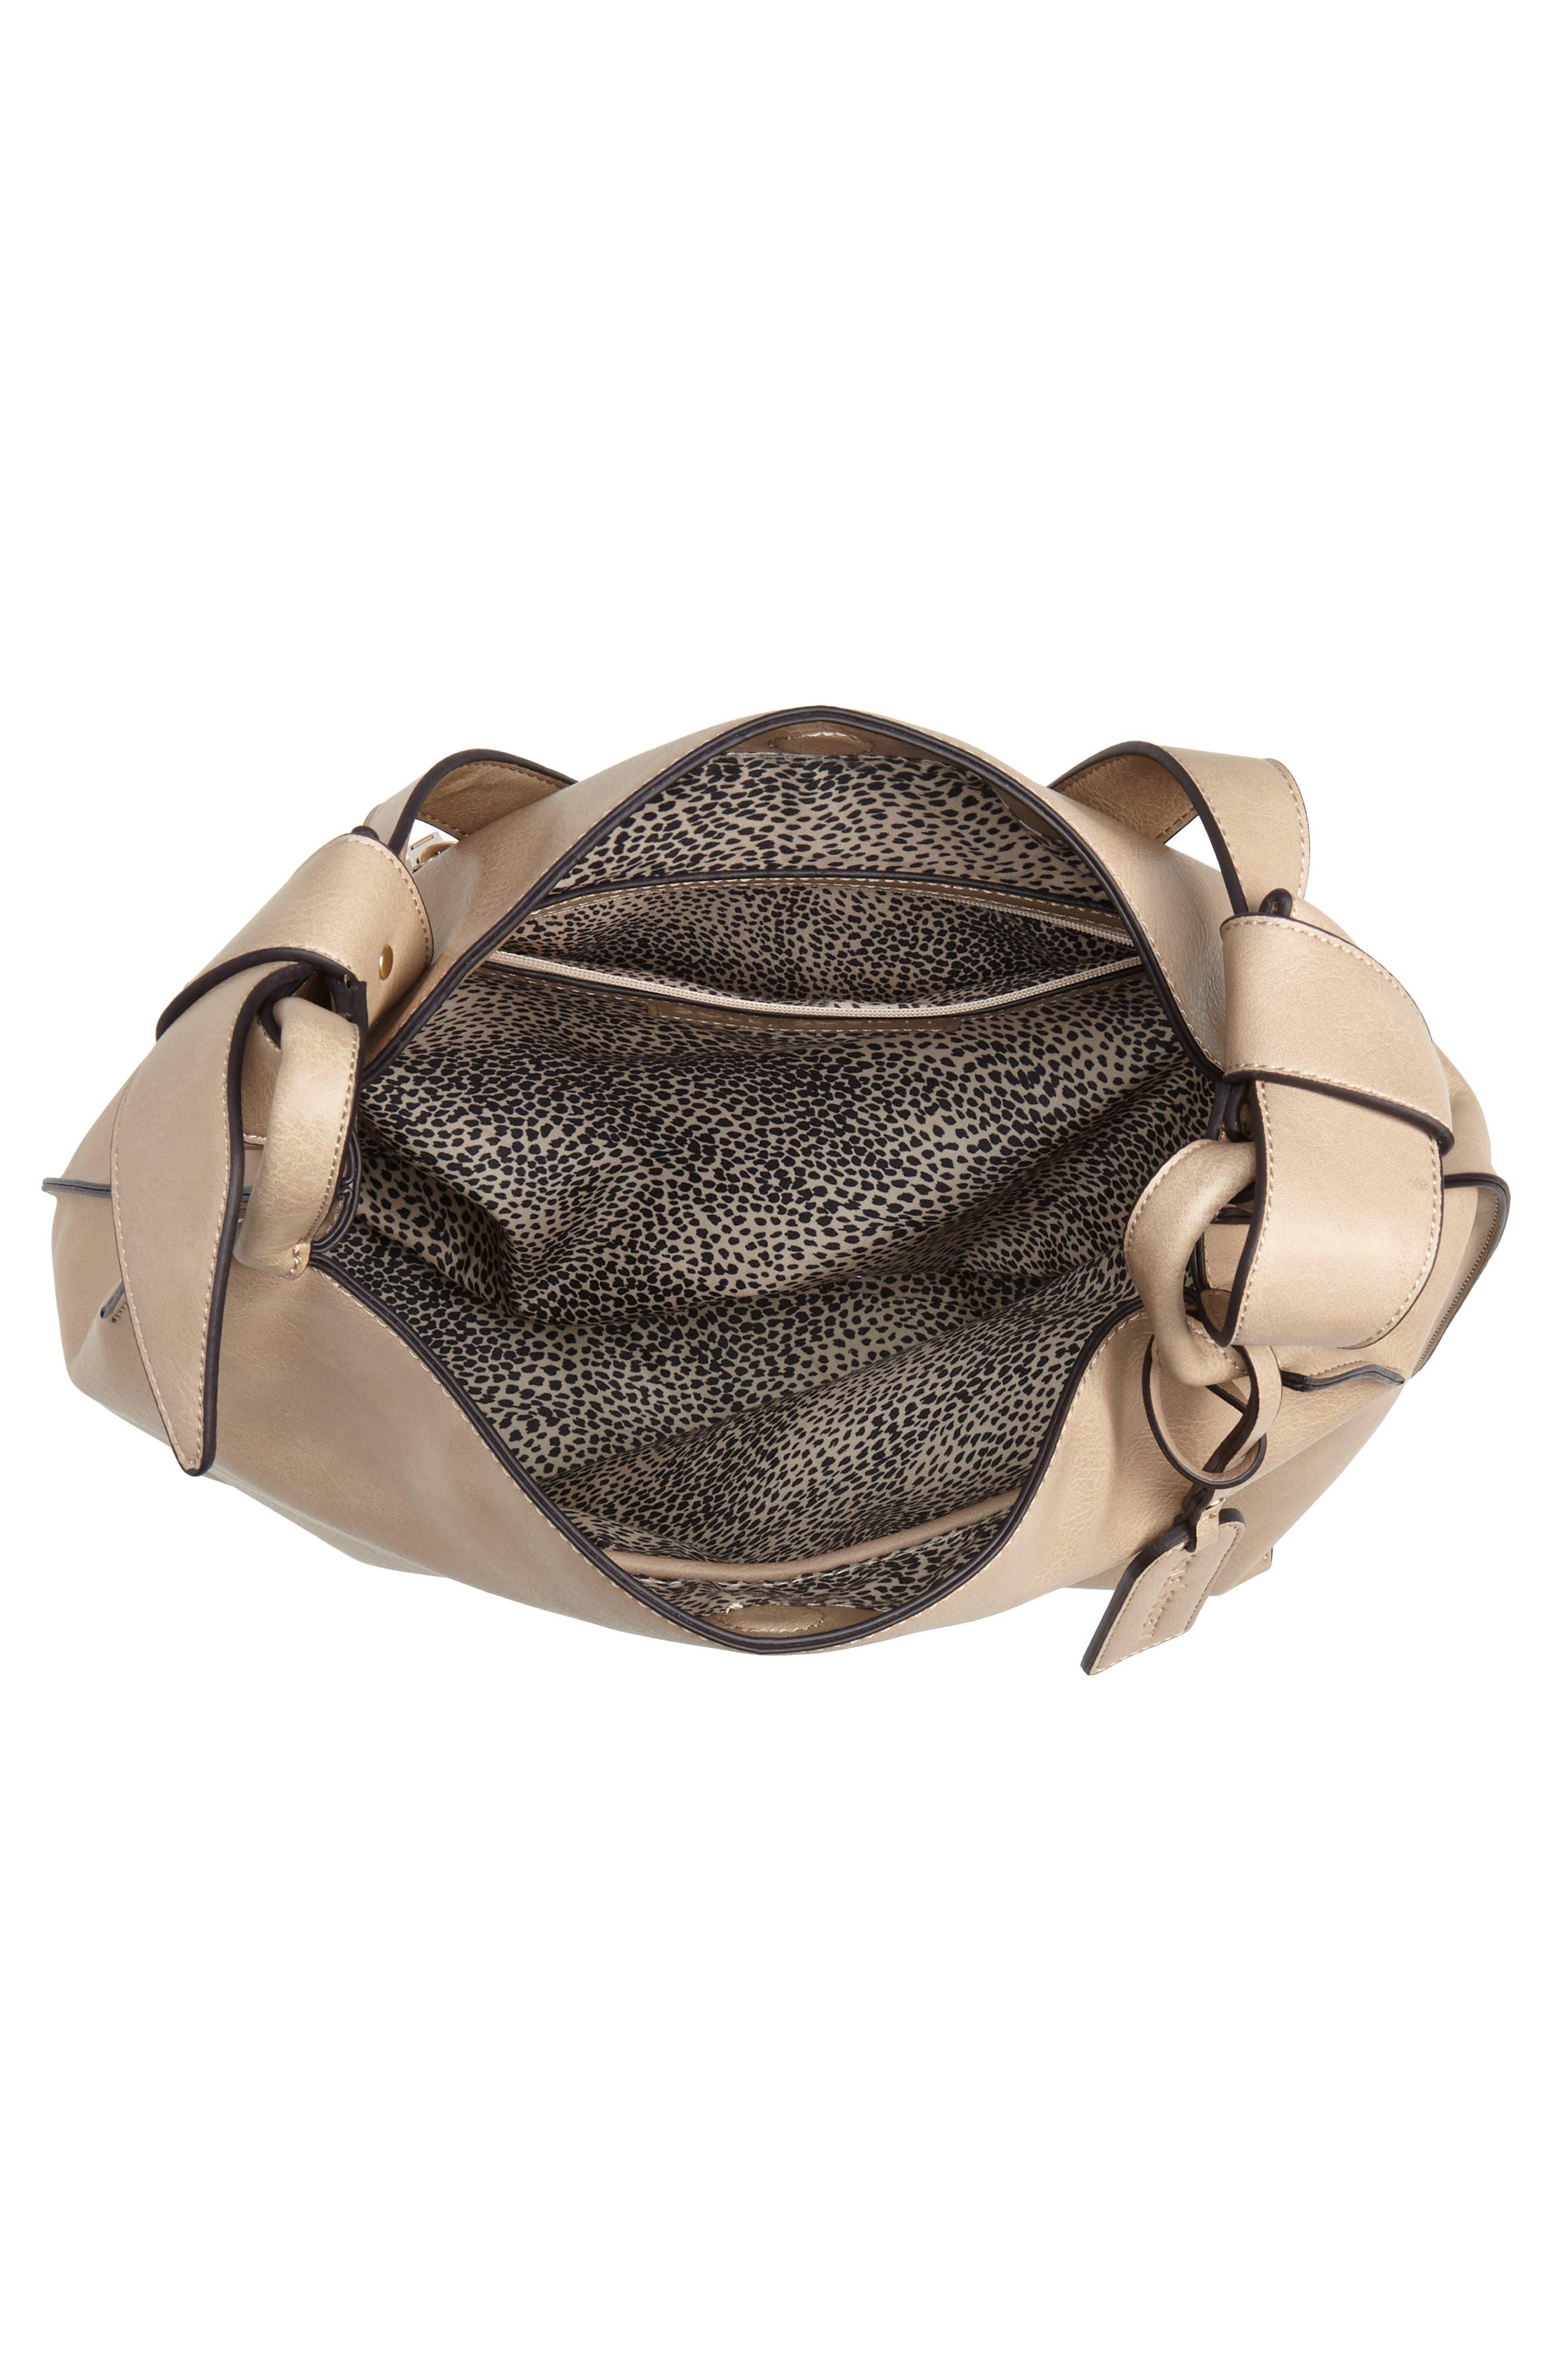 Josah Faux Leather Shoulder Bag,                             Alternate thumbnail 5, color,                             SAFARI